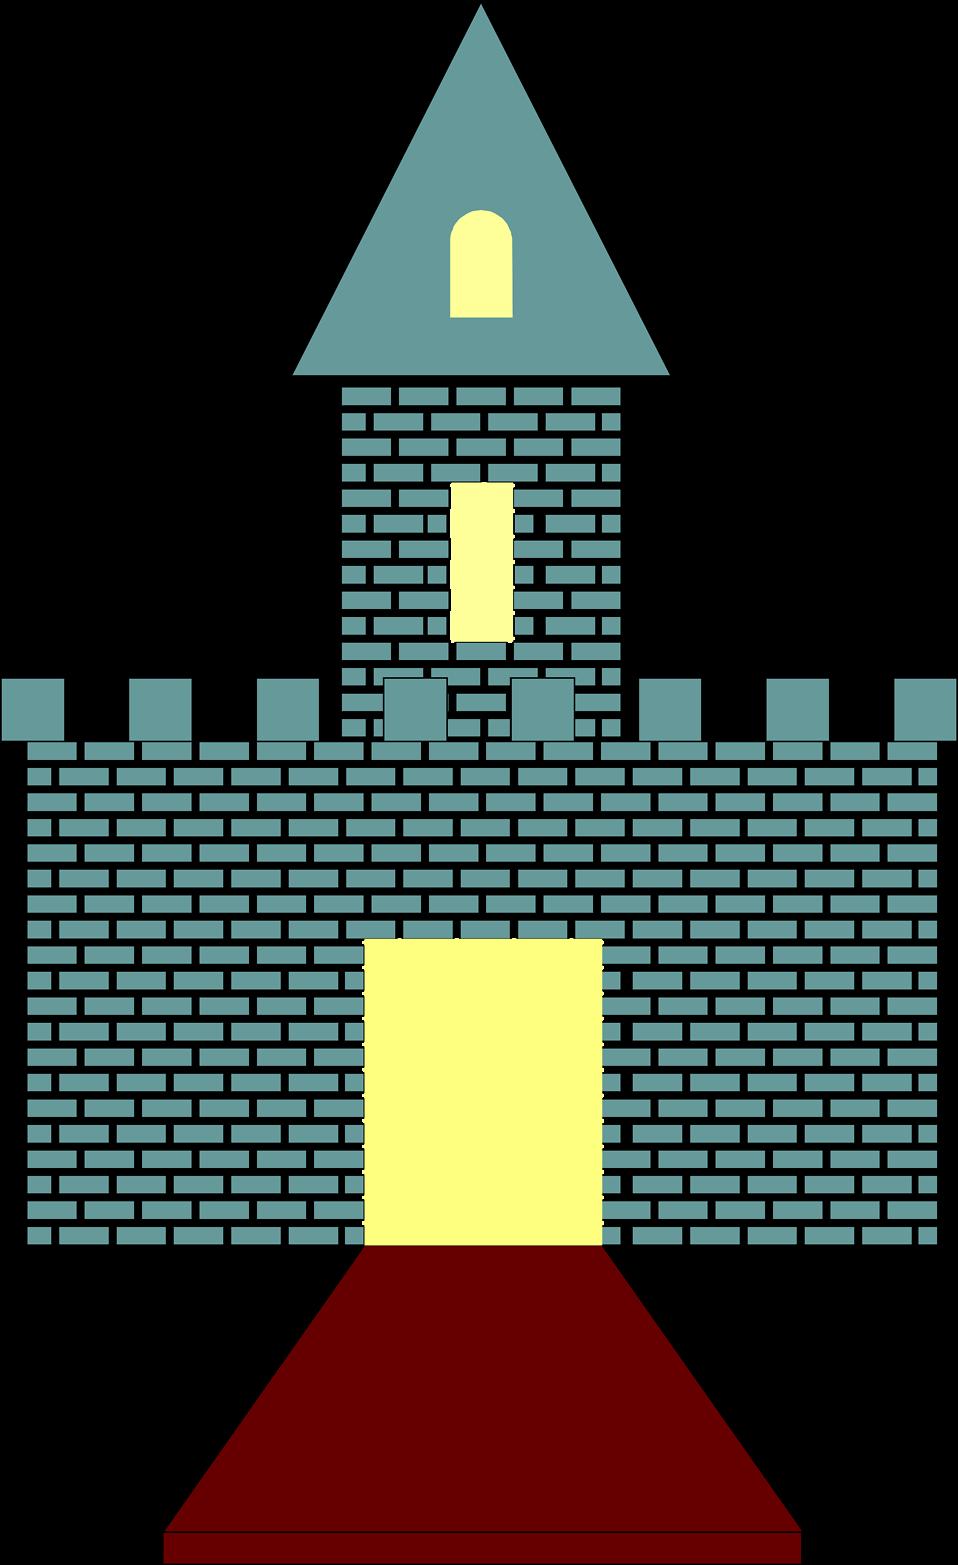 Gate clipart castle gate. Free stock photo illustration